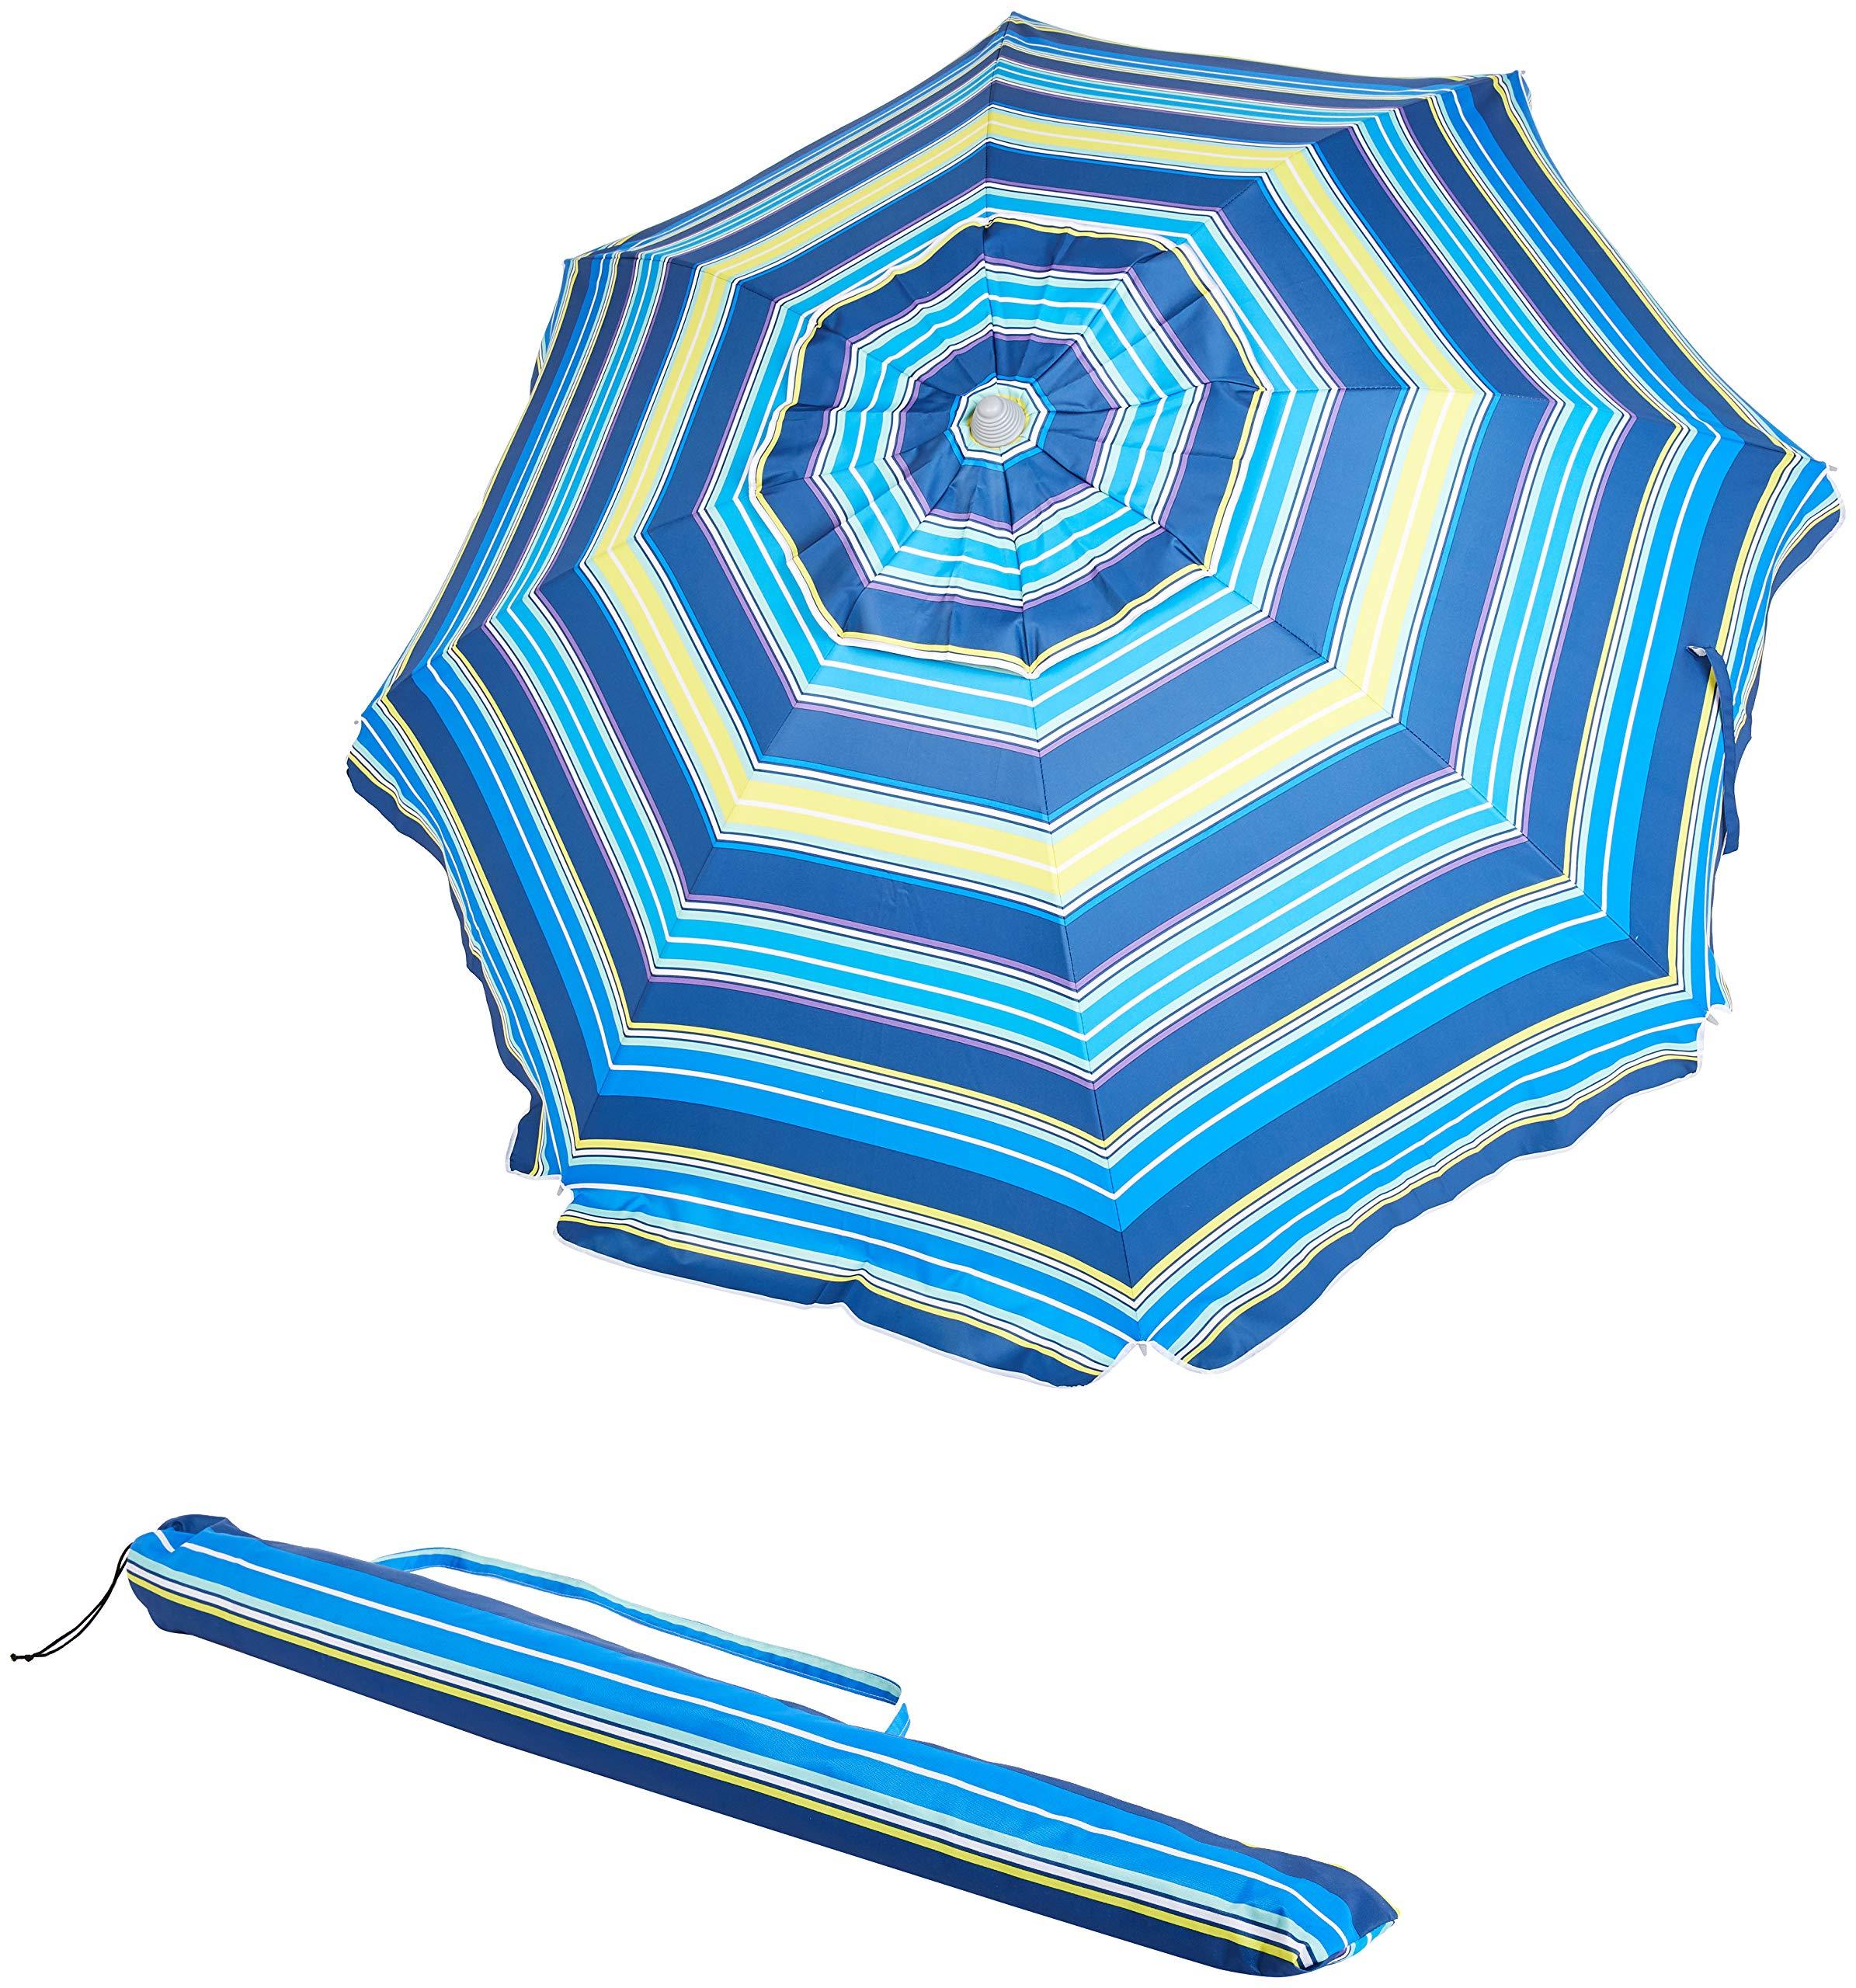 AmazonBasics Beach Sun Umbrella, Blue and Yellow Striped